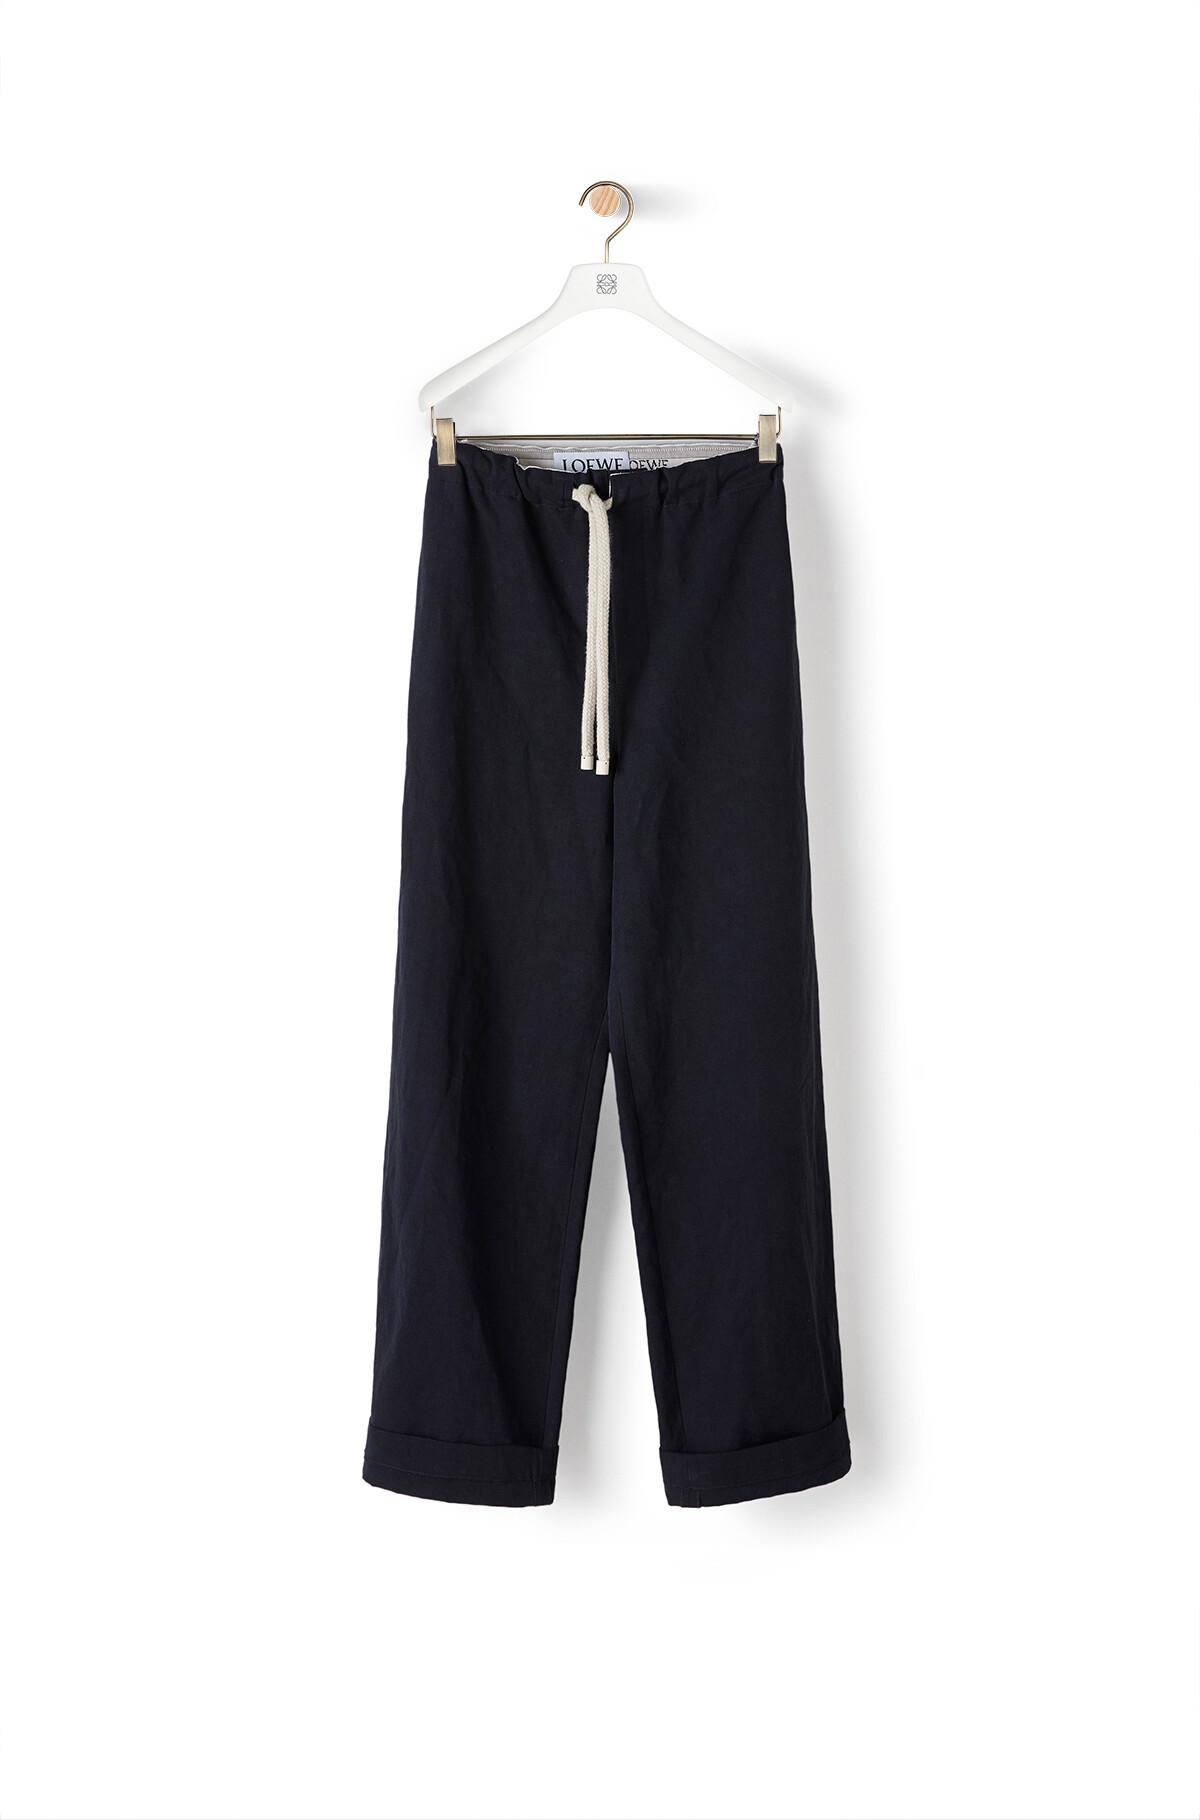 LOEWE Drawstring Trousers Dark Navy Blue front